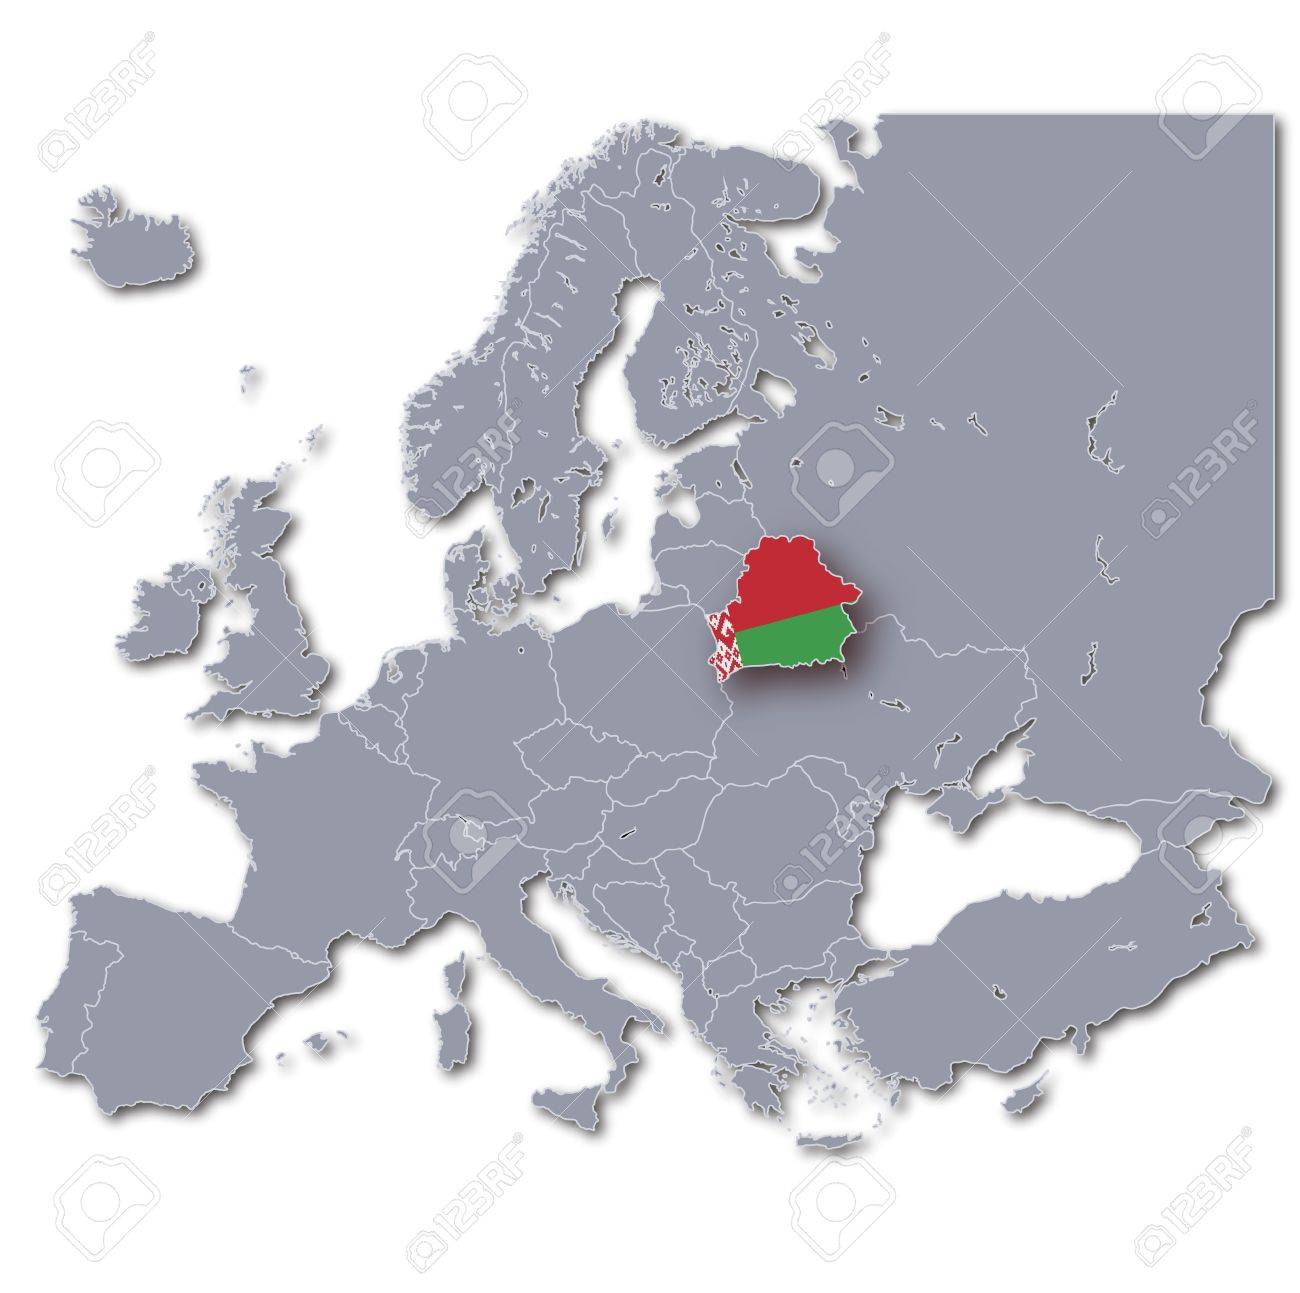 Carte Europe Bielorussie.Carte De L Europe Bielorussie